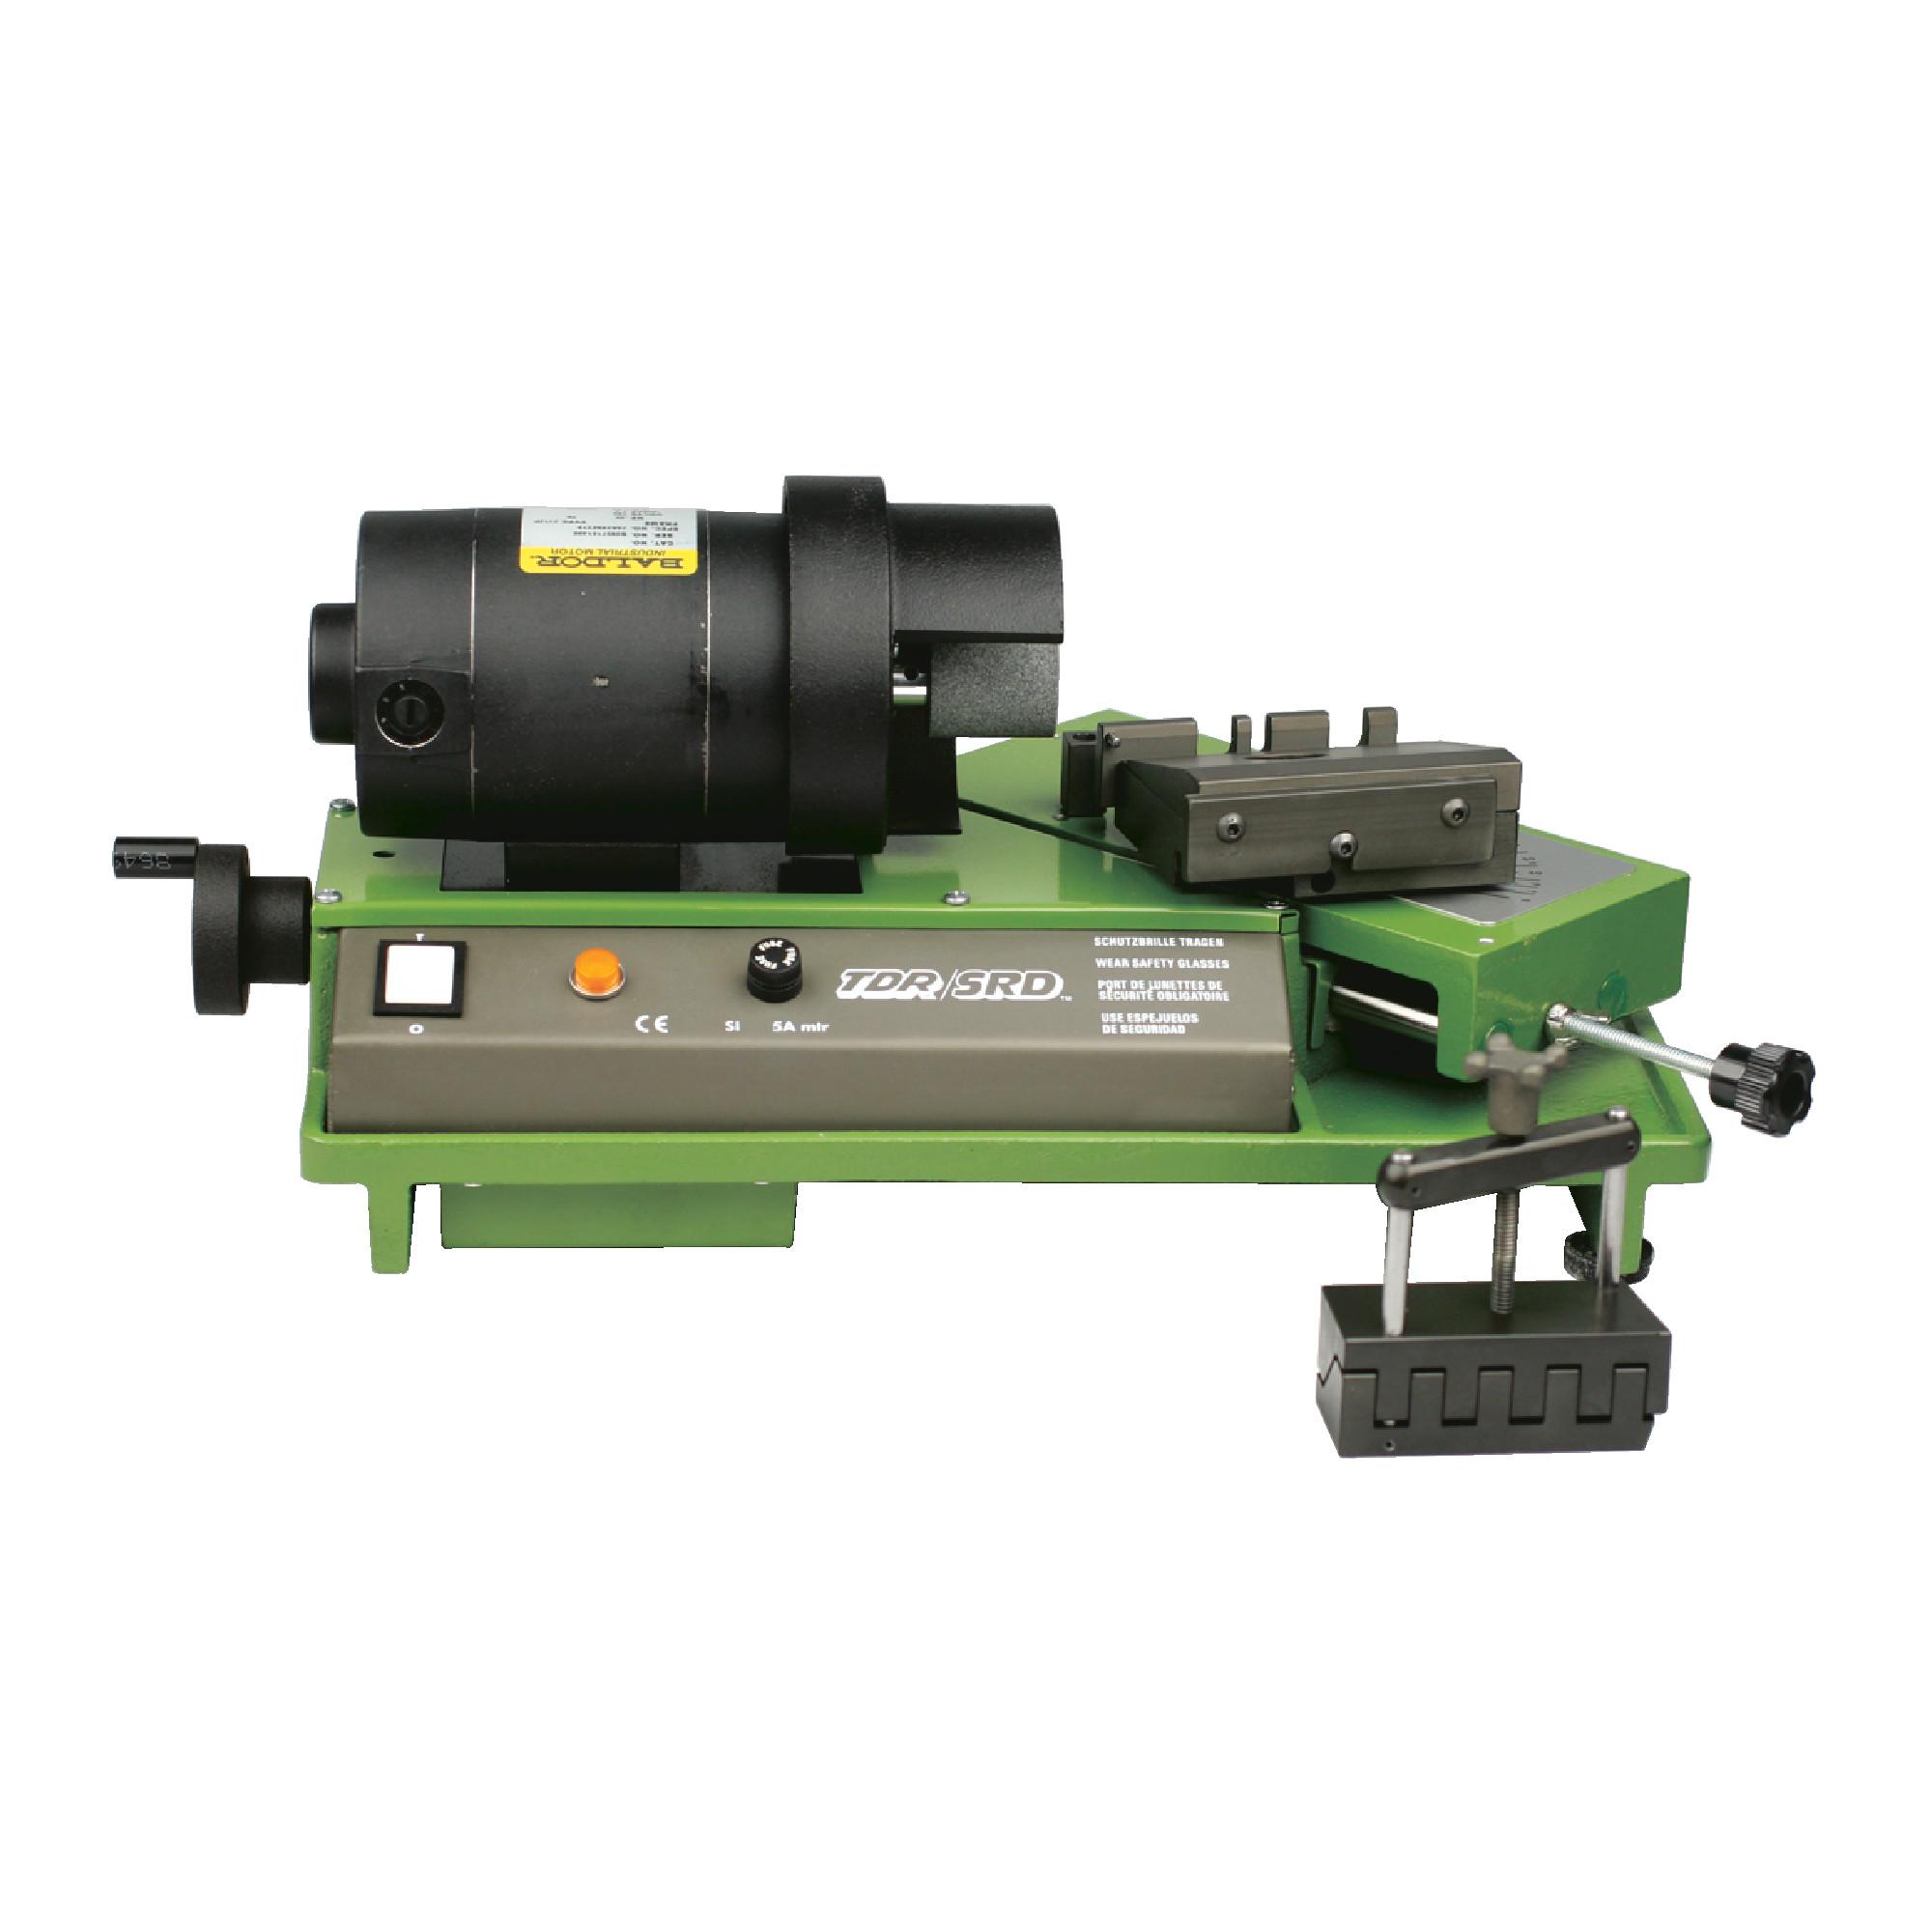 TDR/SRD Drill Grinder